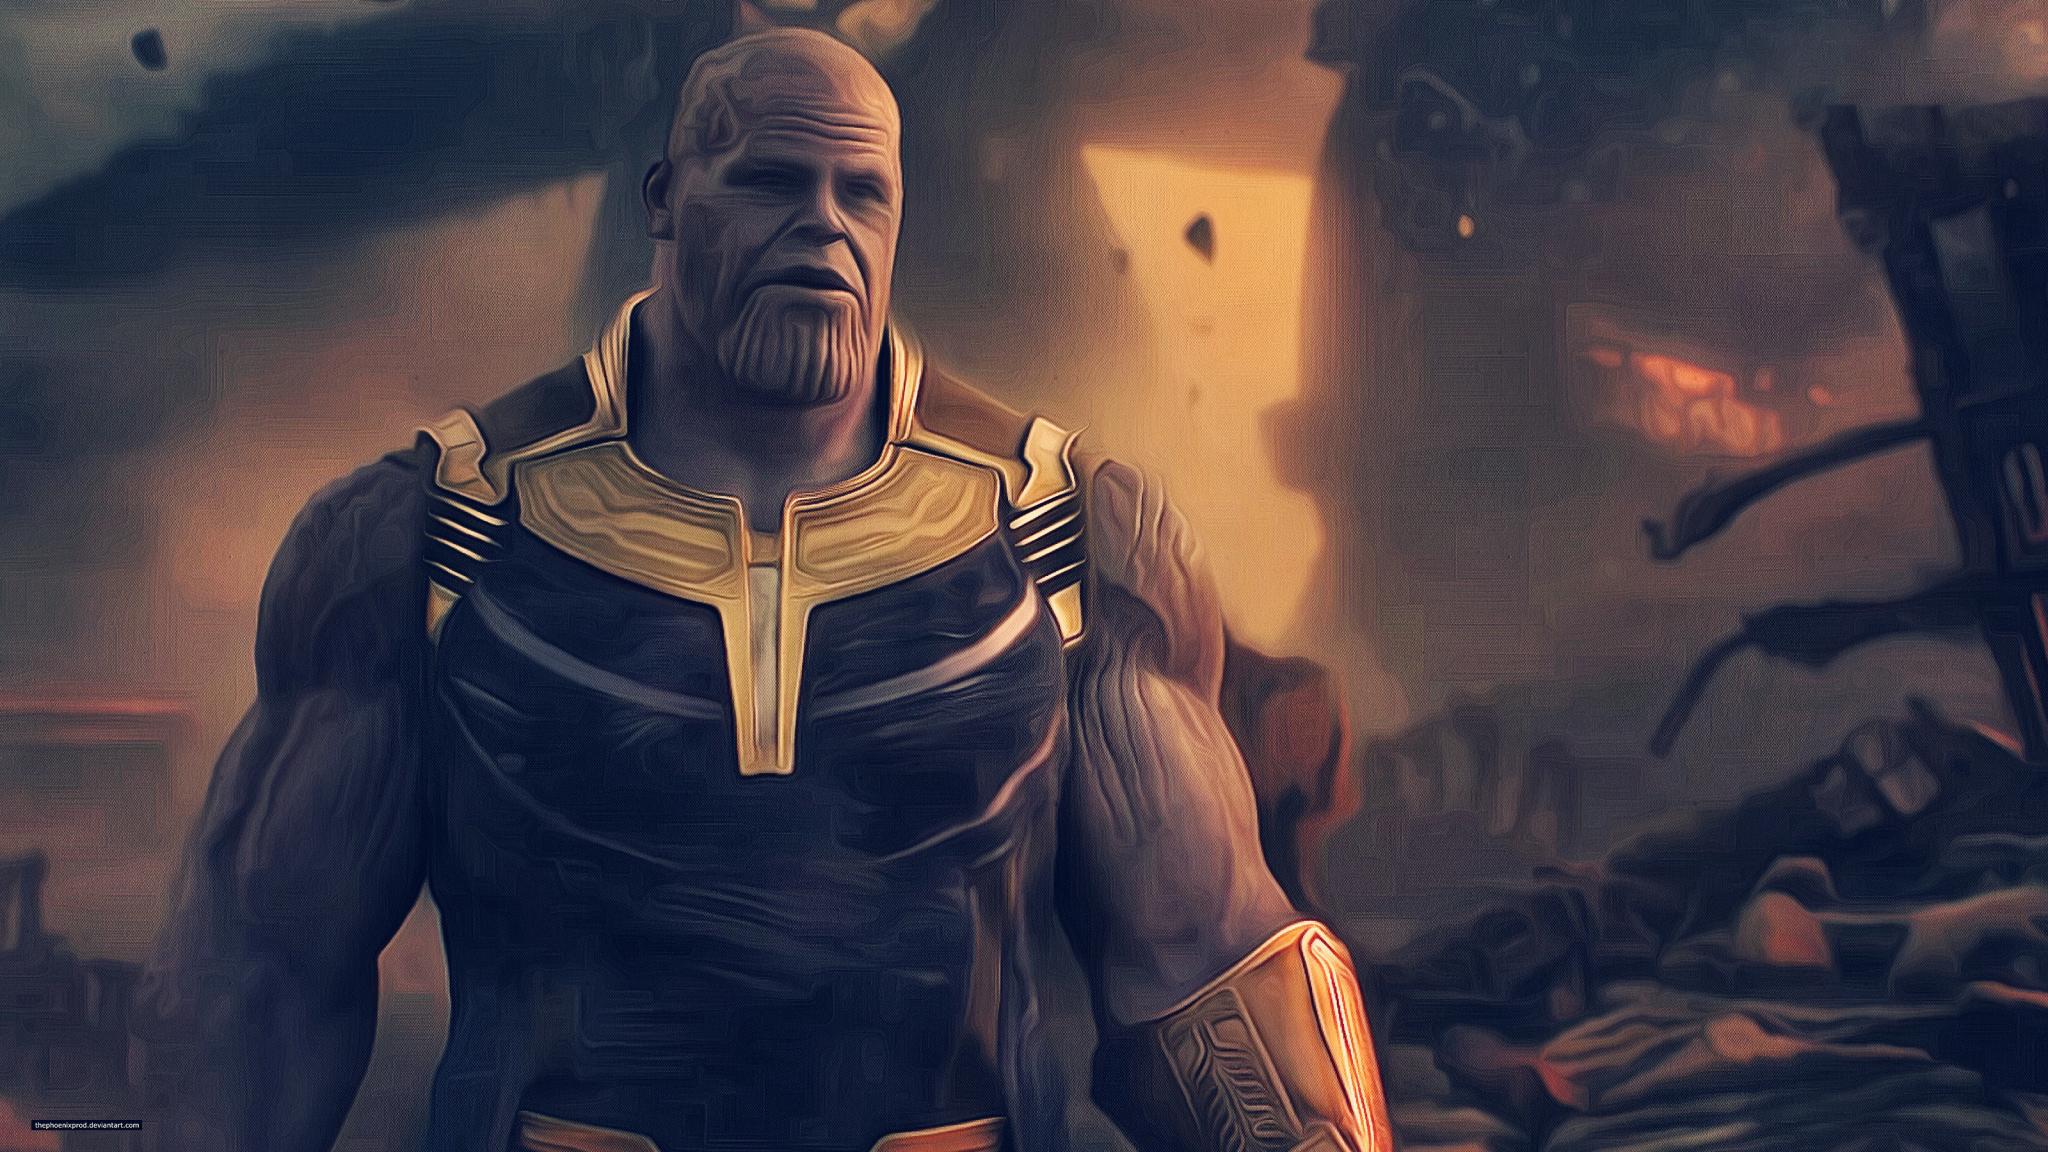 Shuri In Avengers Infinity War New Poster Hd Movies 4k: Thanos Avengers Infinity War Artwork, HD 4K Wallpaper